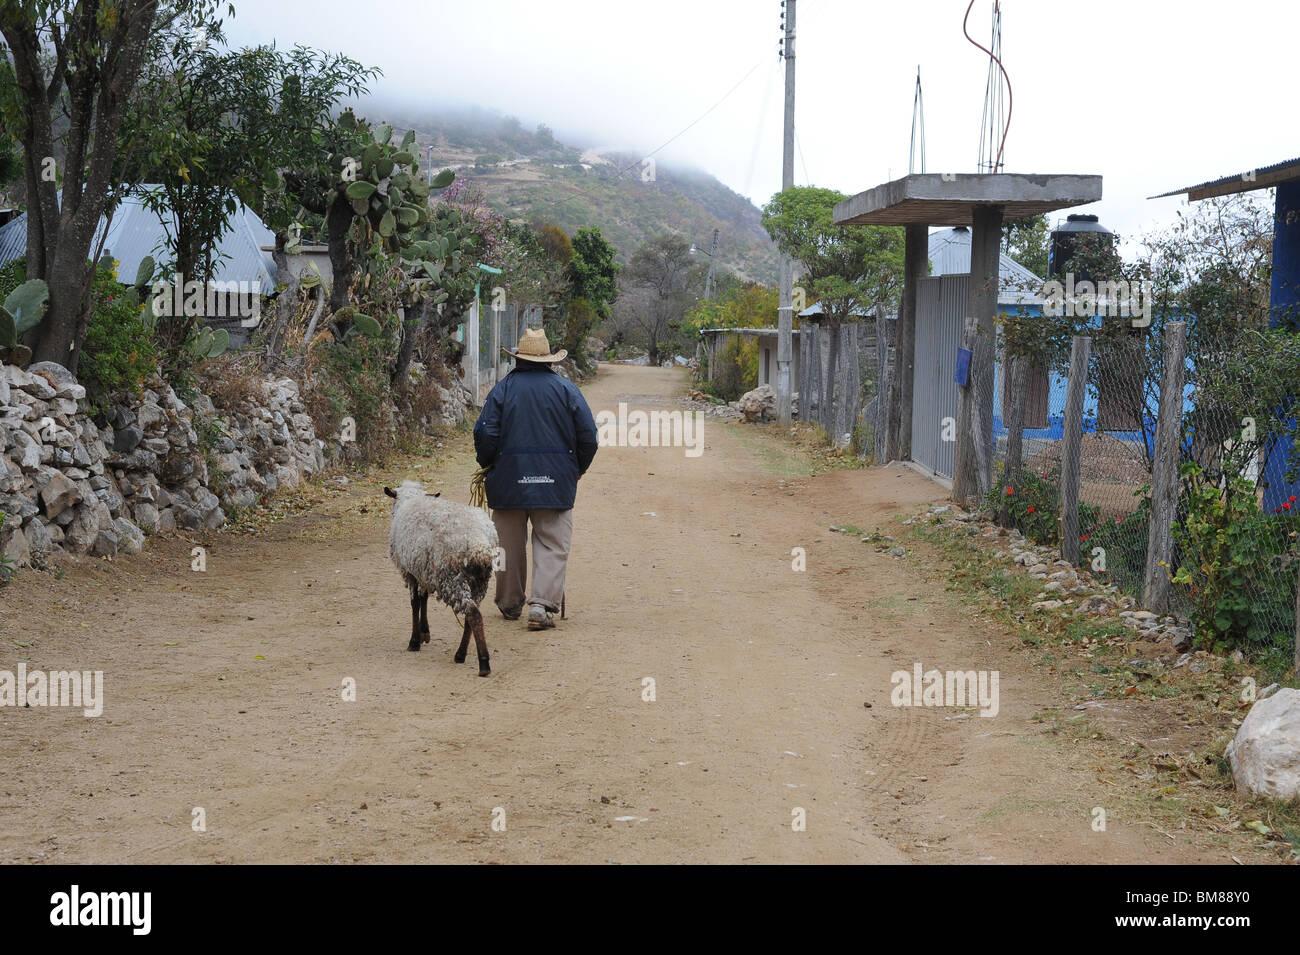 Man leading sheep along quiet country road in Santiago Apoala, Mexico. - Stock Image